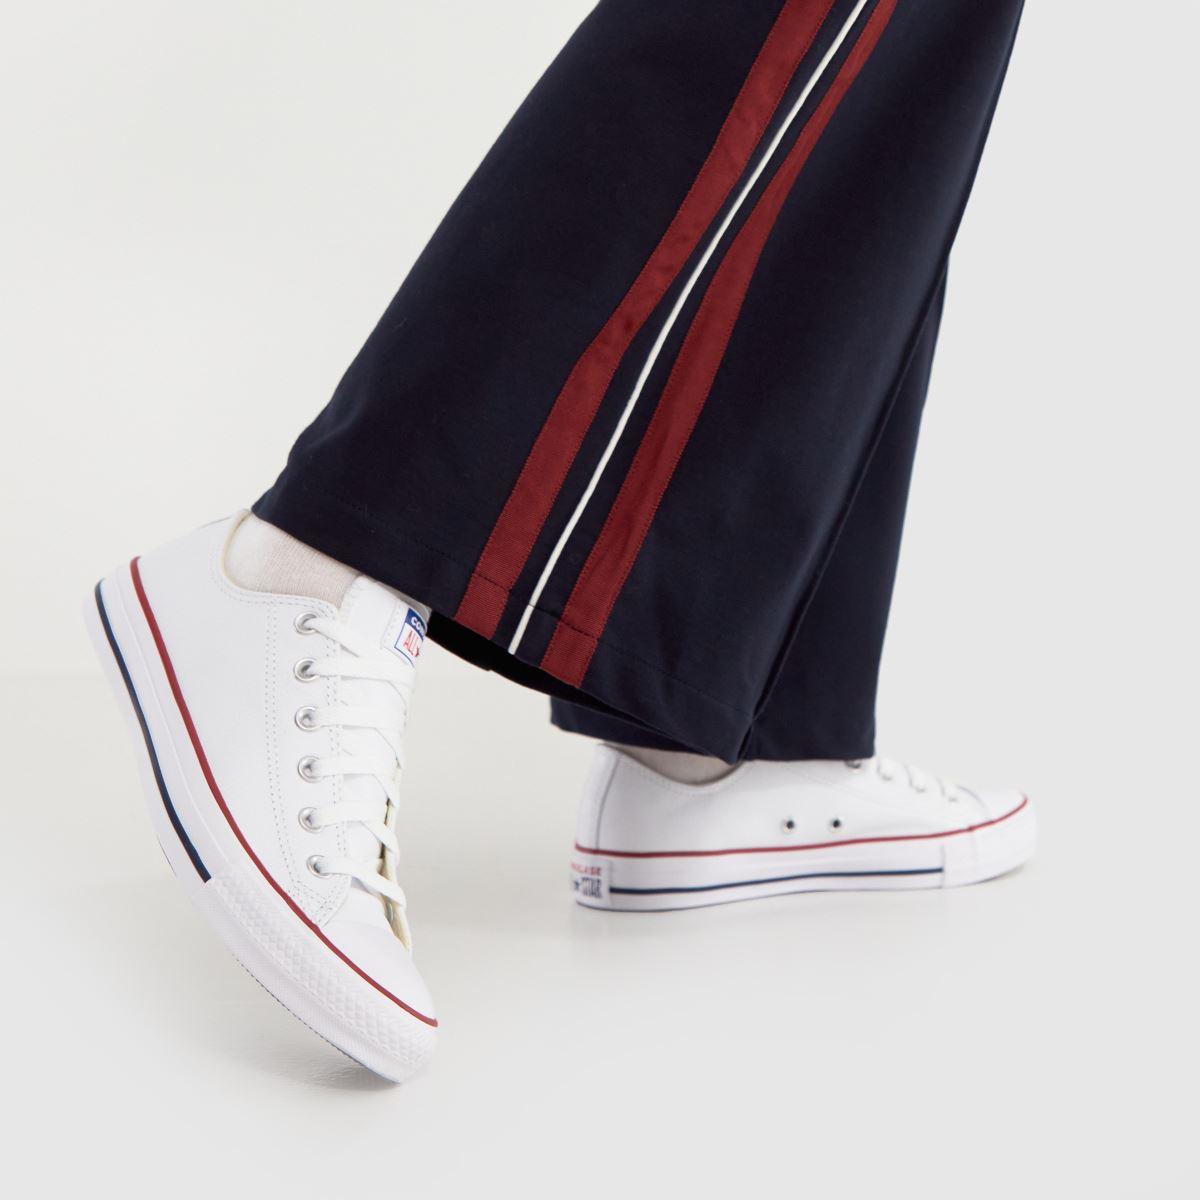 Damen Weiß converse All Star Oxford Leather Sneaker | schuh Gute Qualität beliebte Schuhe